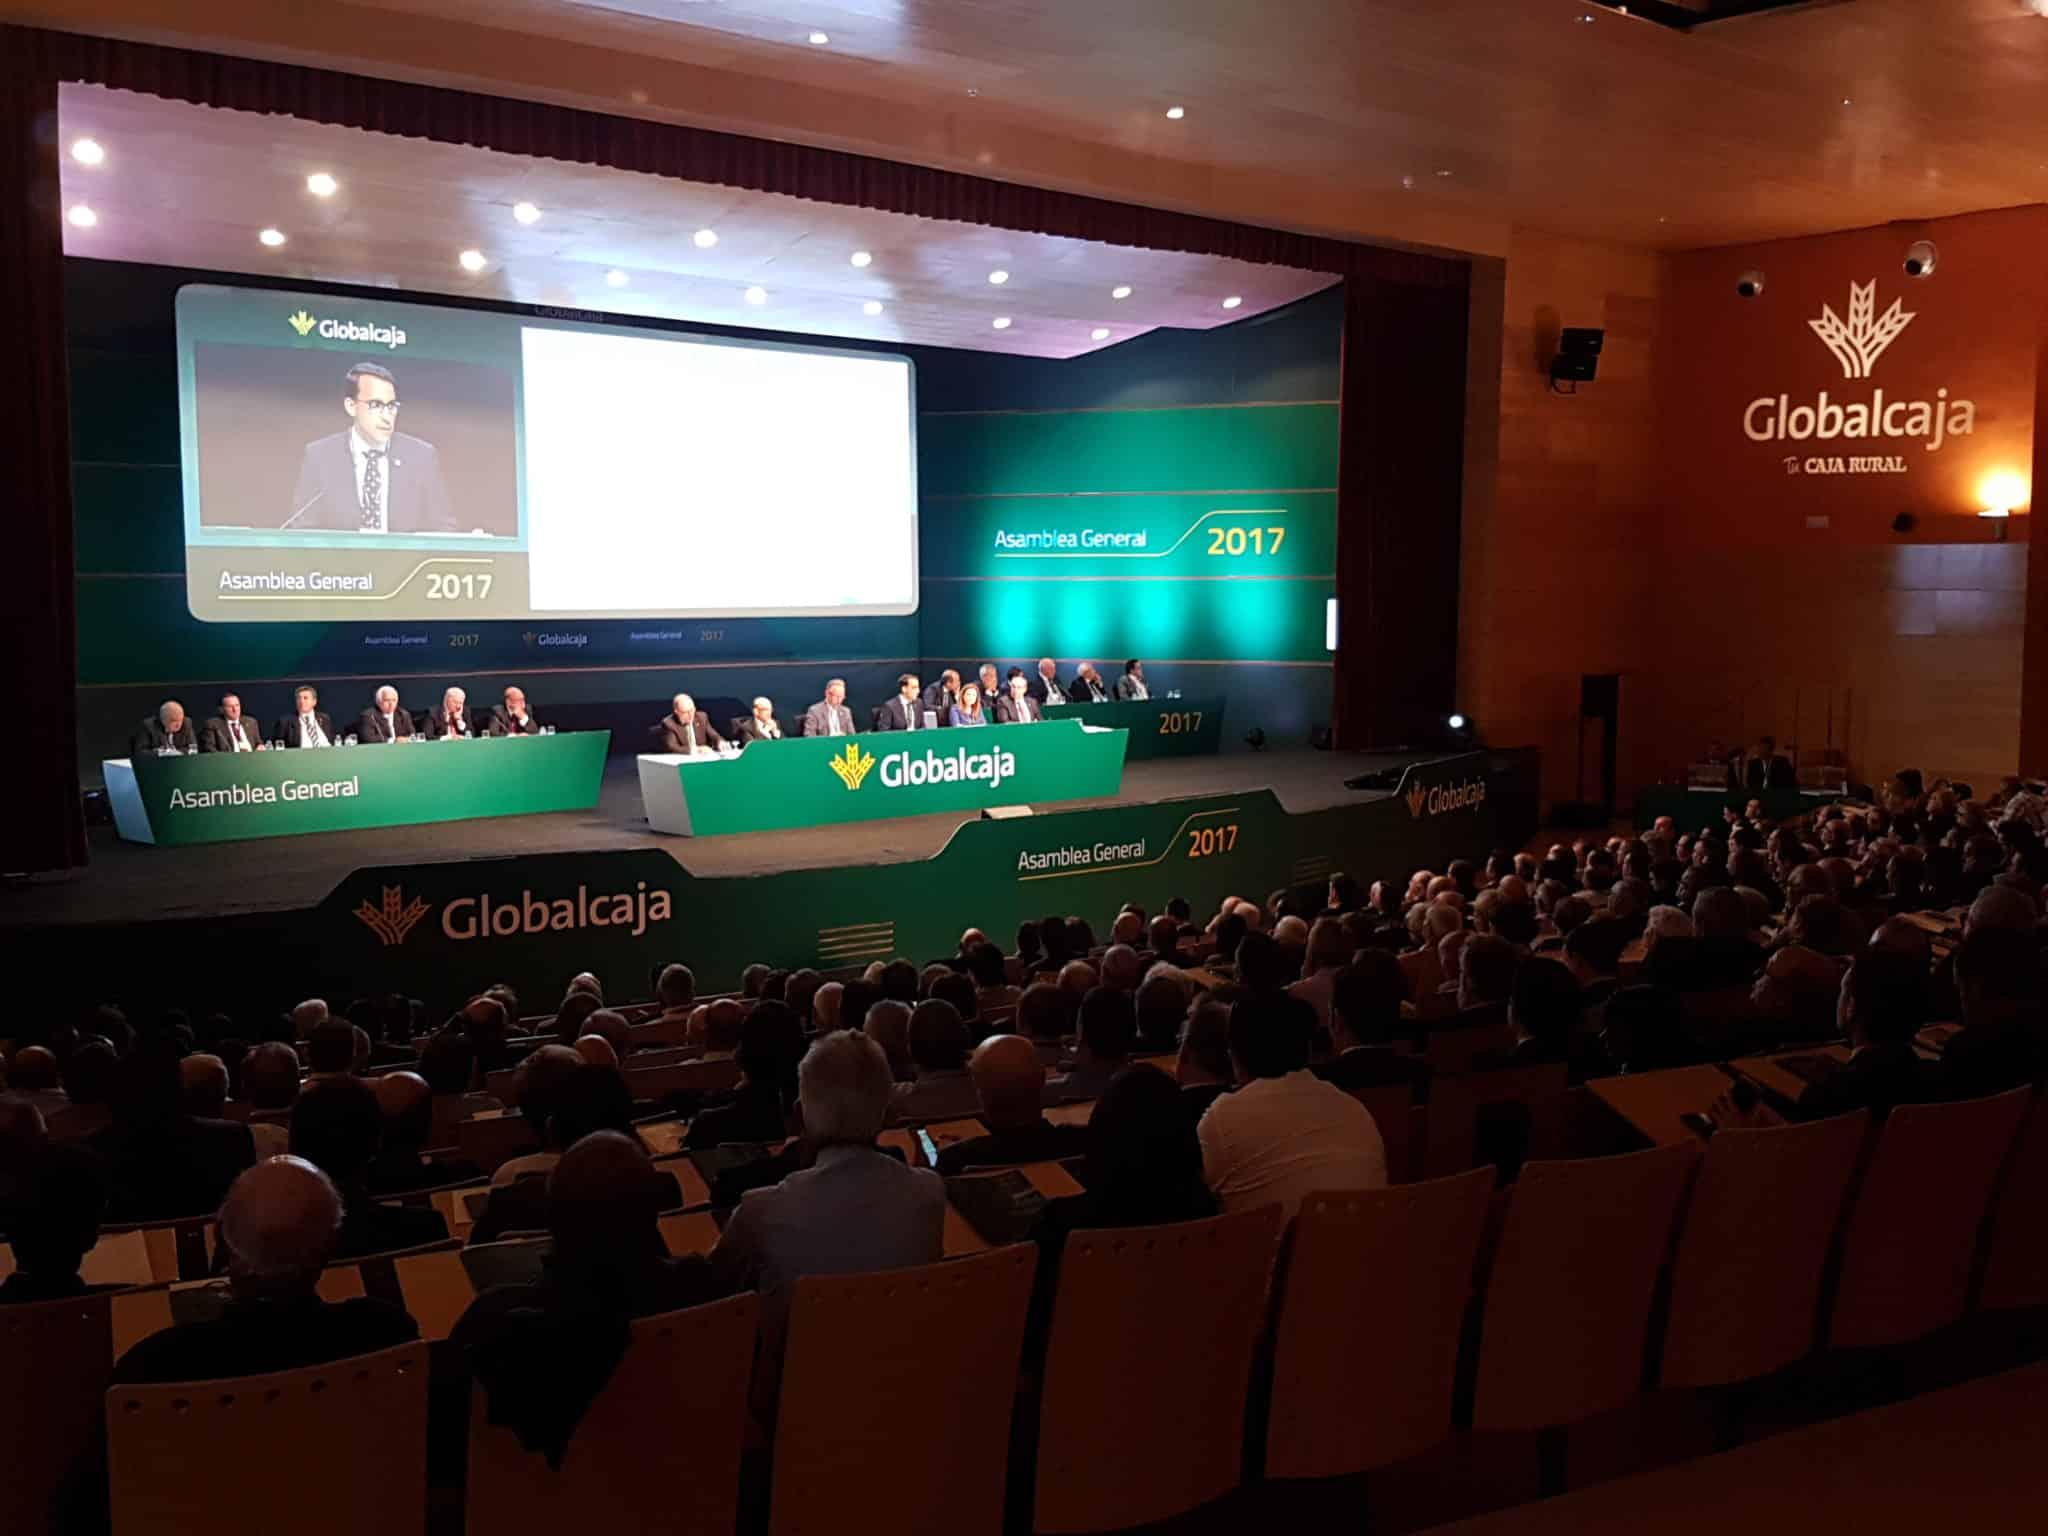 Asamblea General Globalcaja